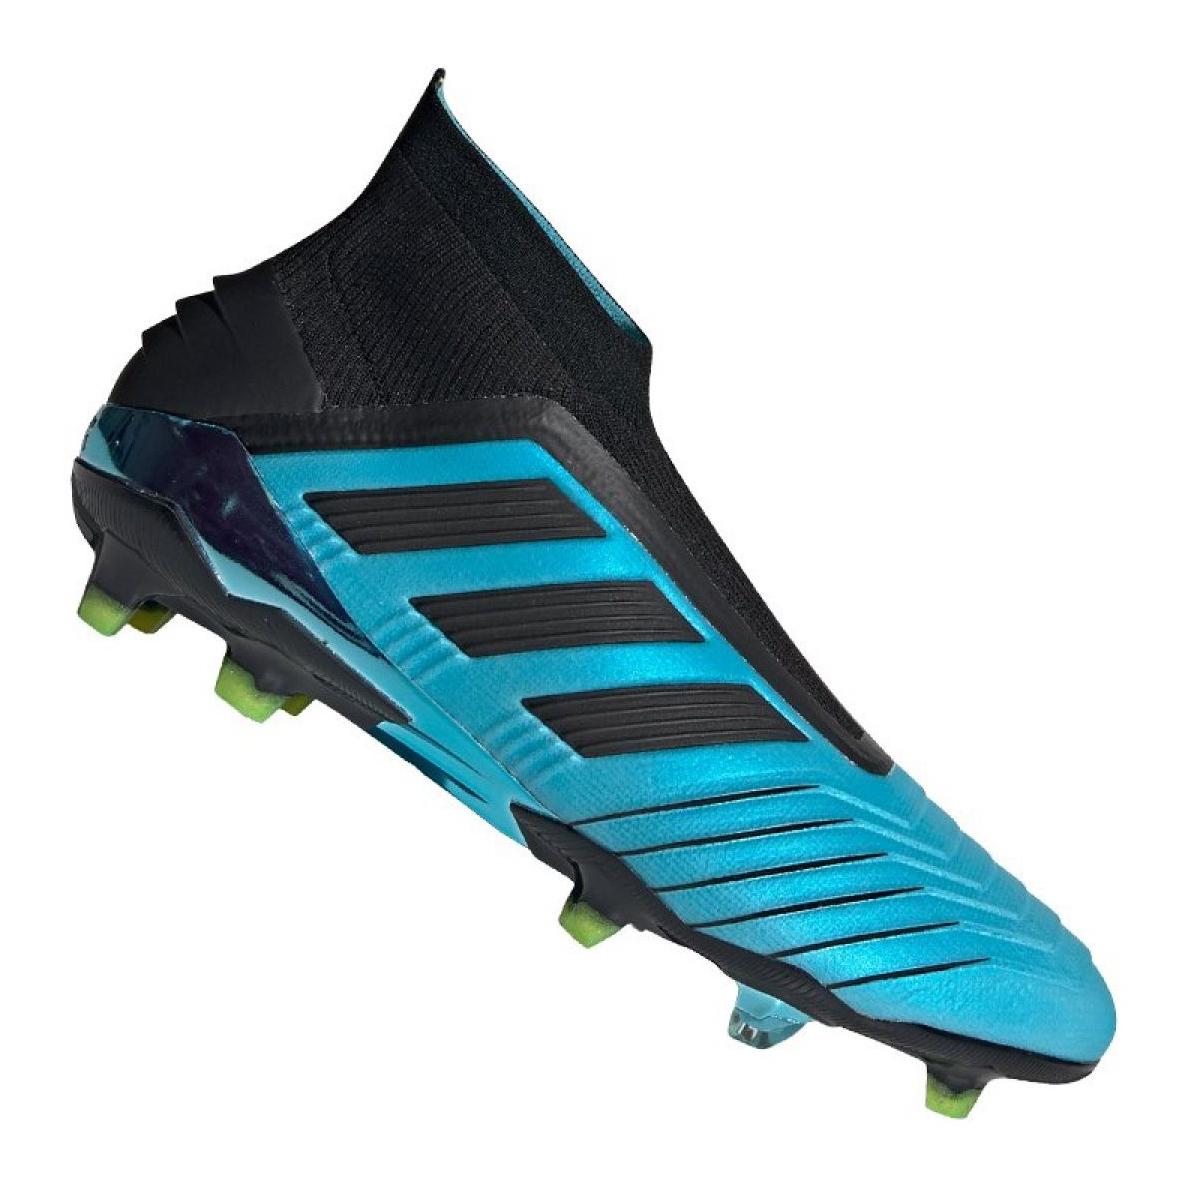 Adidas Predator 19+ FG (Herr)